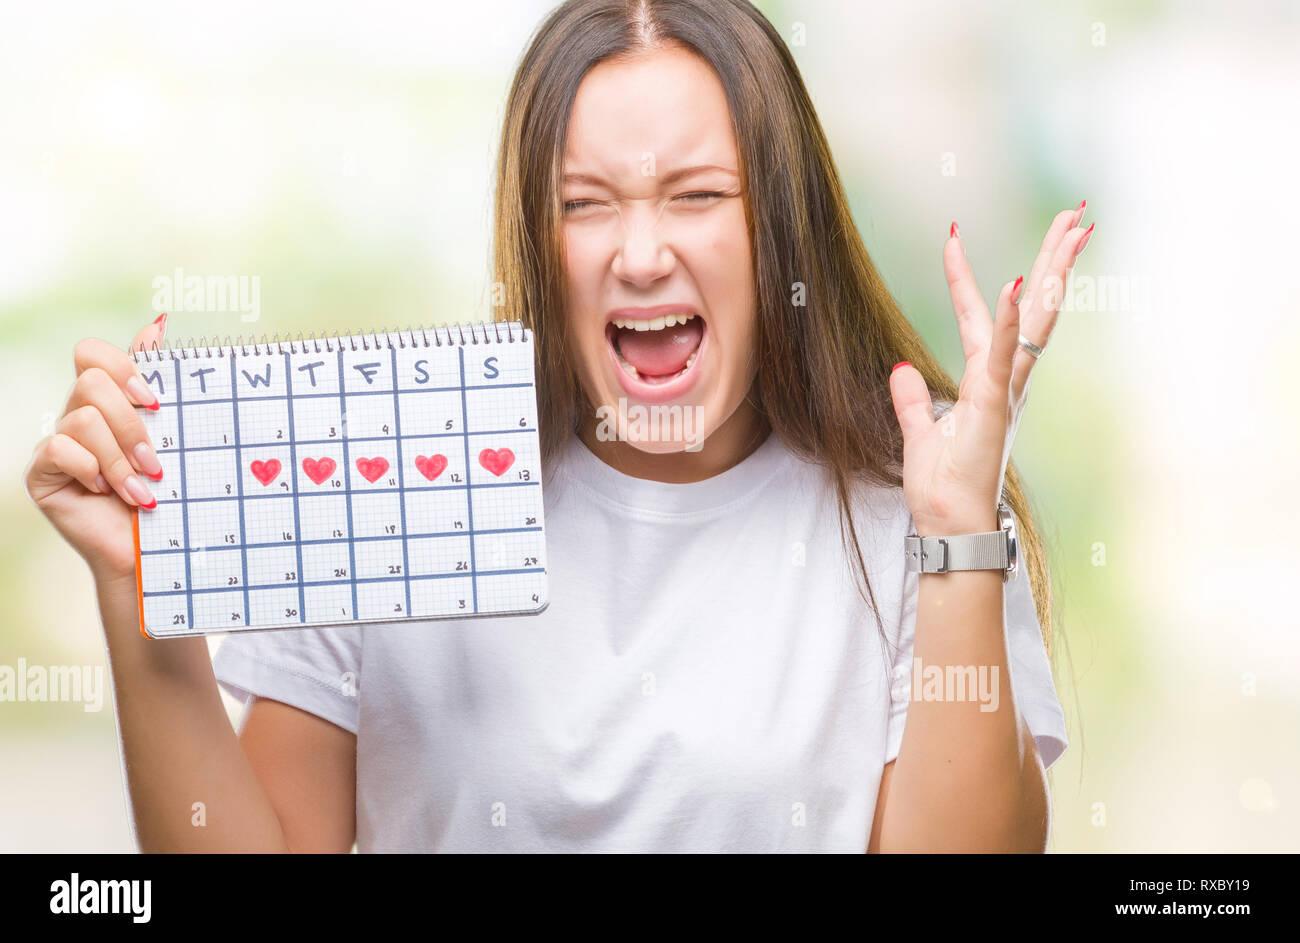 young-caucasian-woman-holding-menstruati